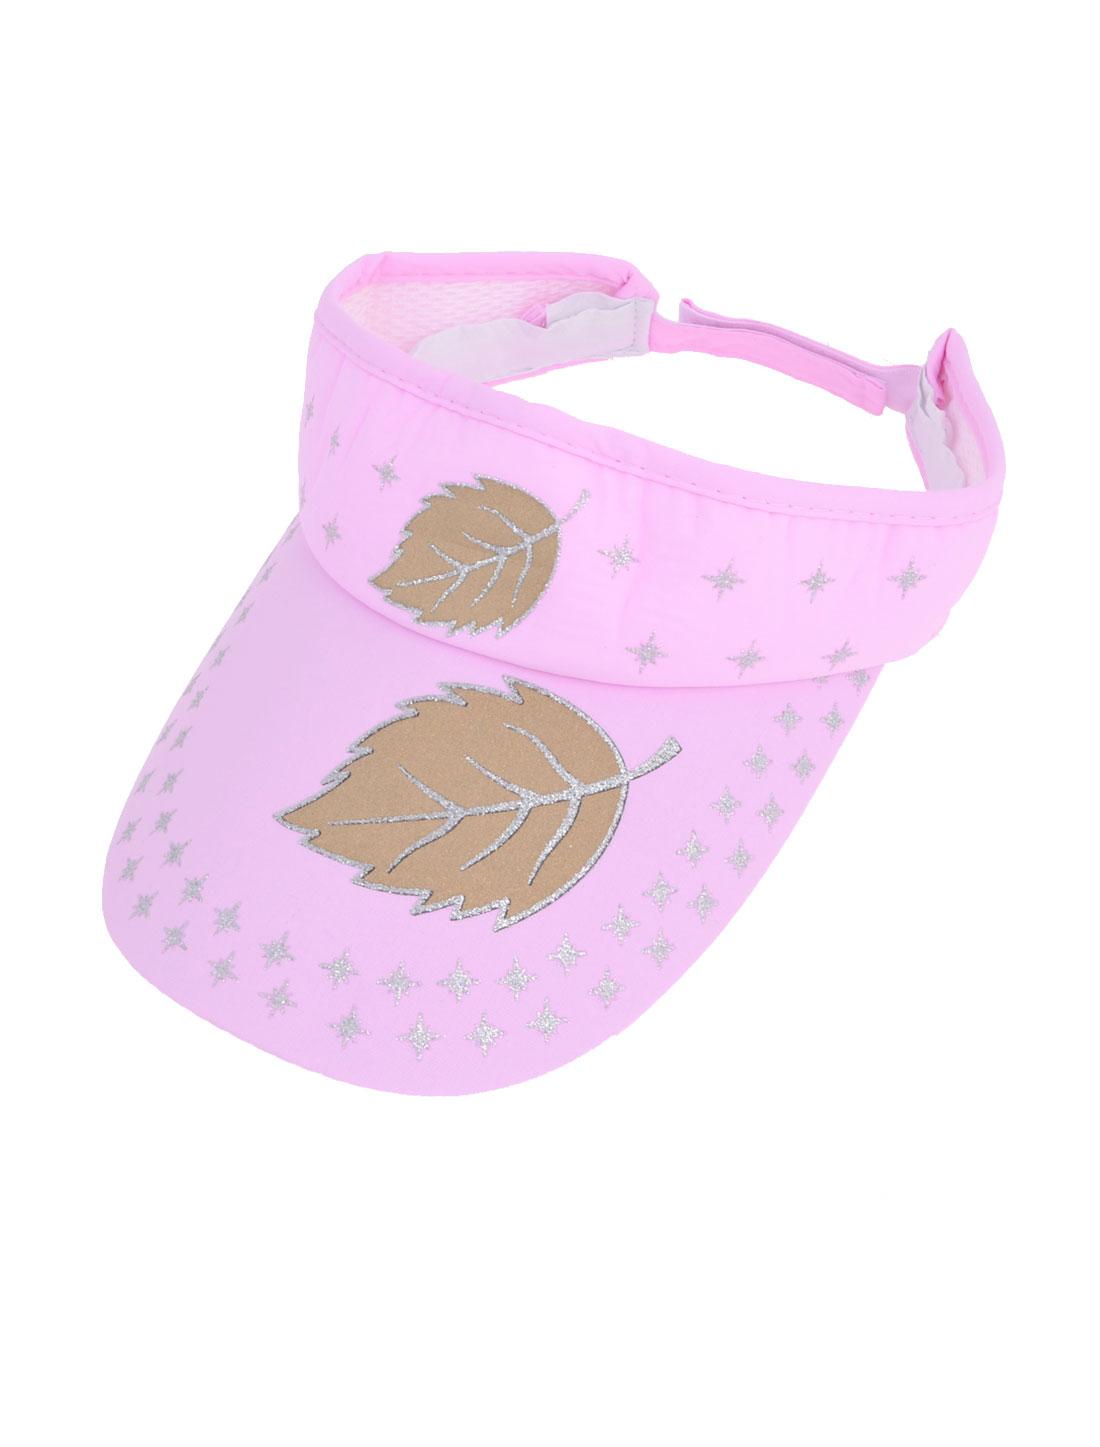 Lady Brown Leaf Printed Adjustable Opened Top Summer Sun Visor Hat Pink